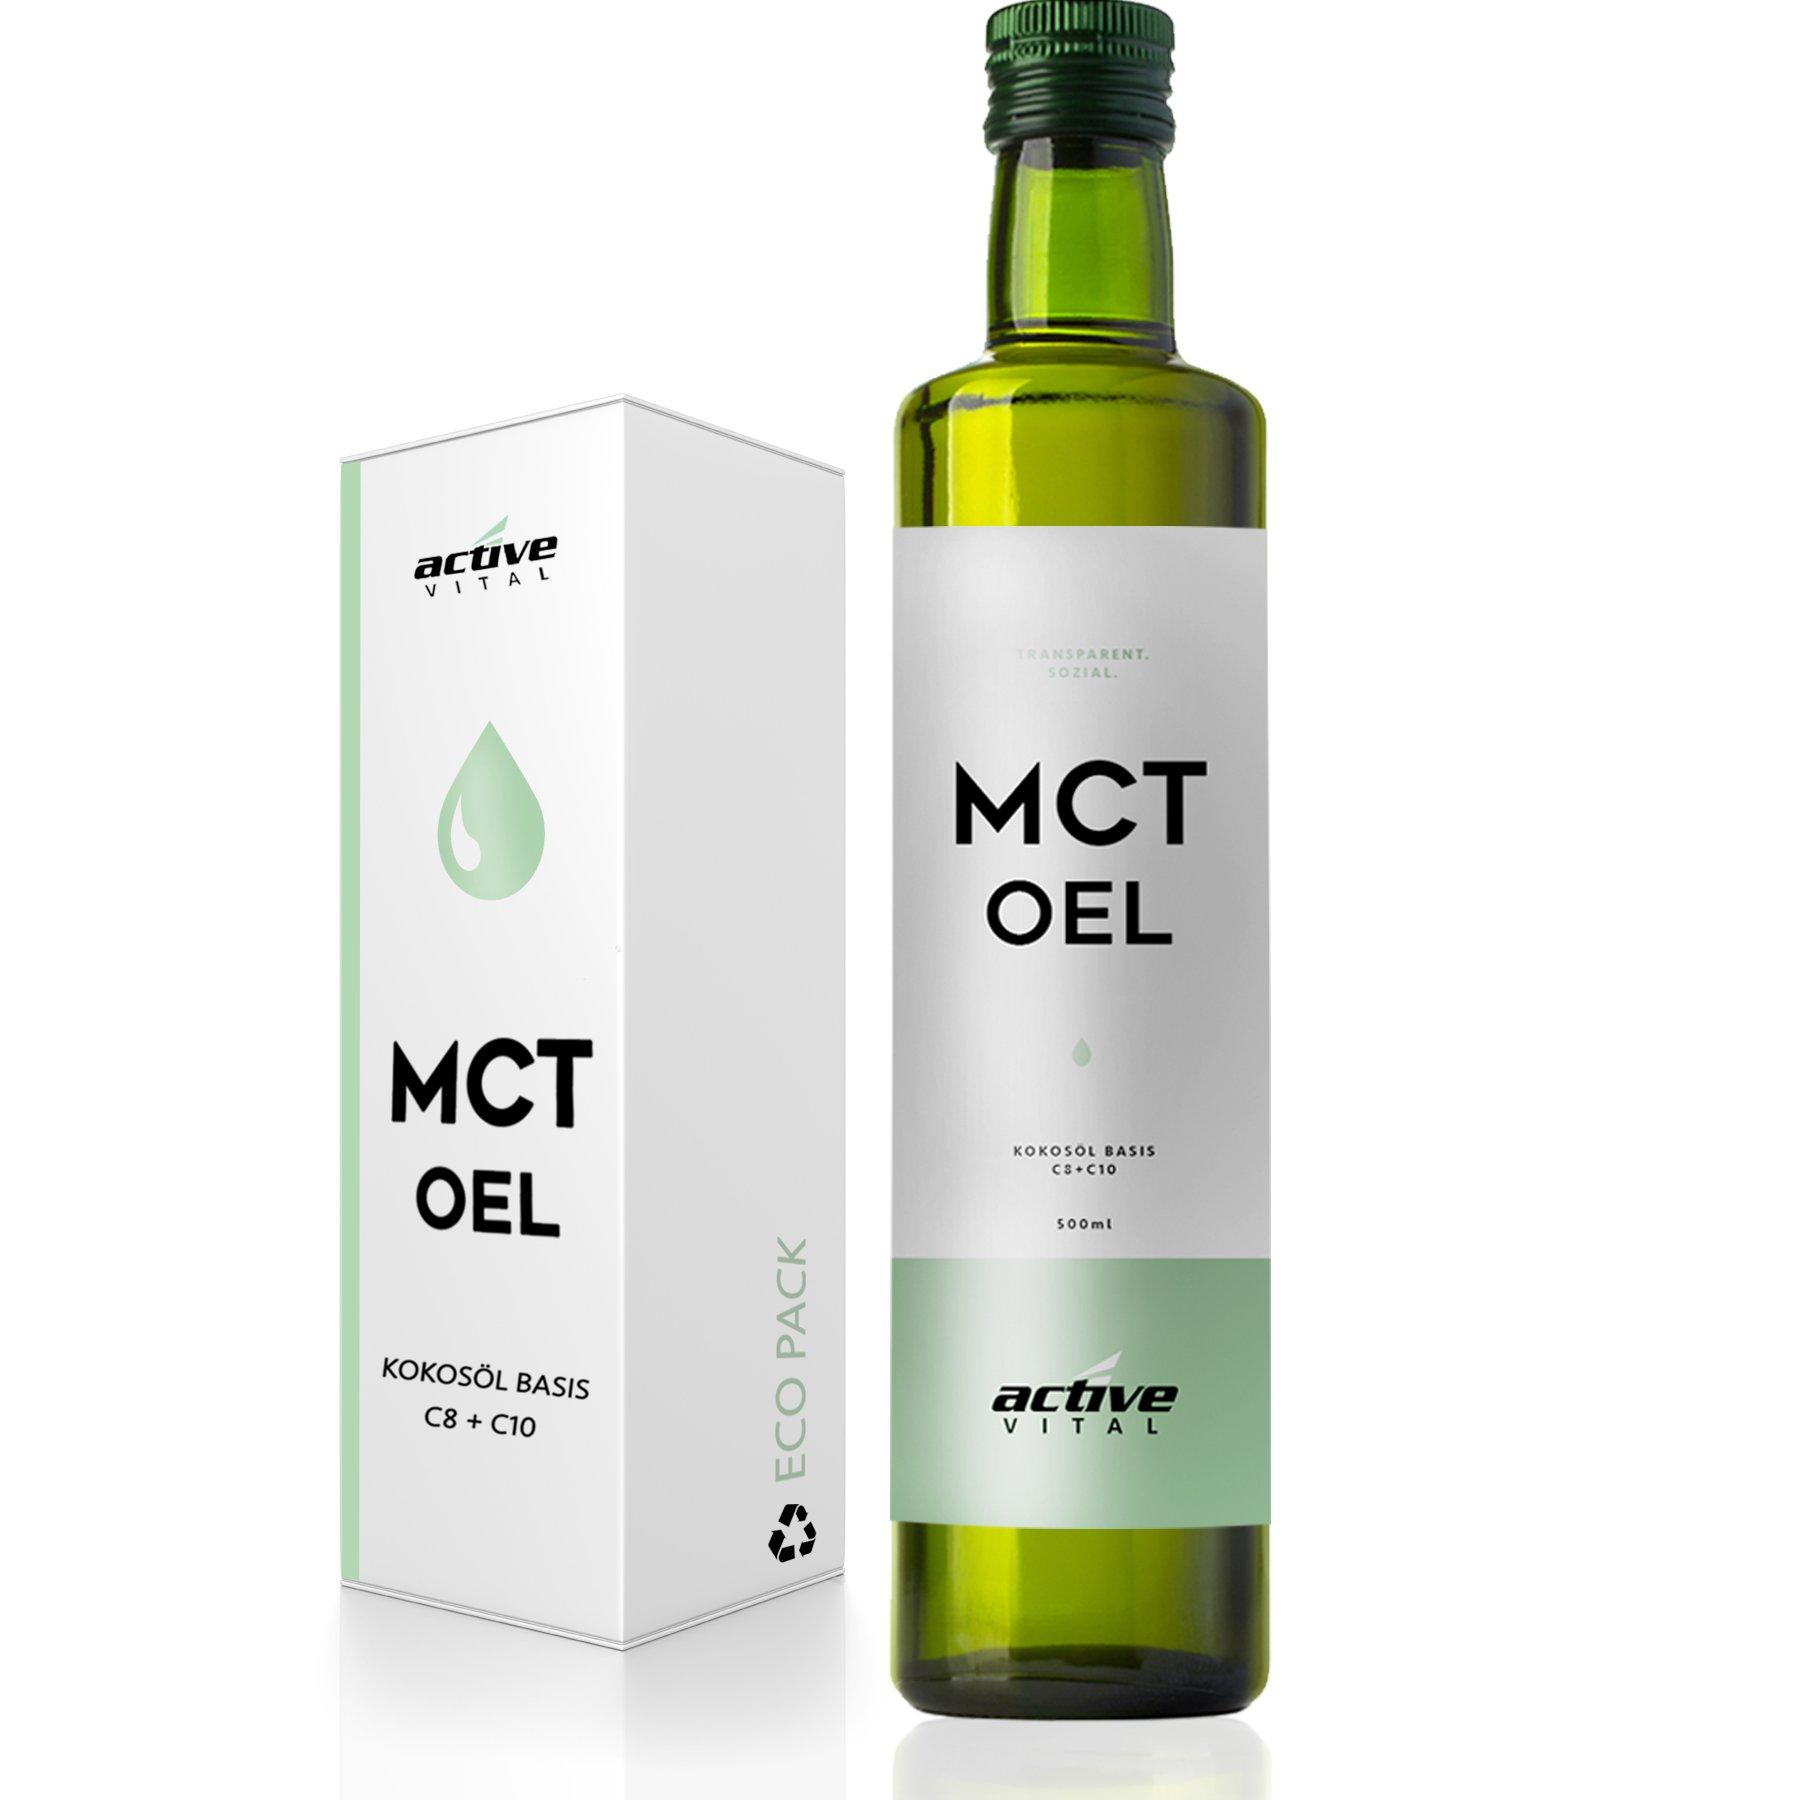 MCT-Öl | ACTIVEVITAL | 500ml Neutral aus Kokos-Öl | Bulletproof Coffee | Keto | Caprylsäure (C-8) und Caprinsäure (C-10) | Vegan product image